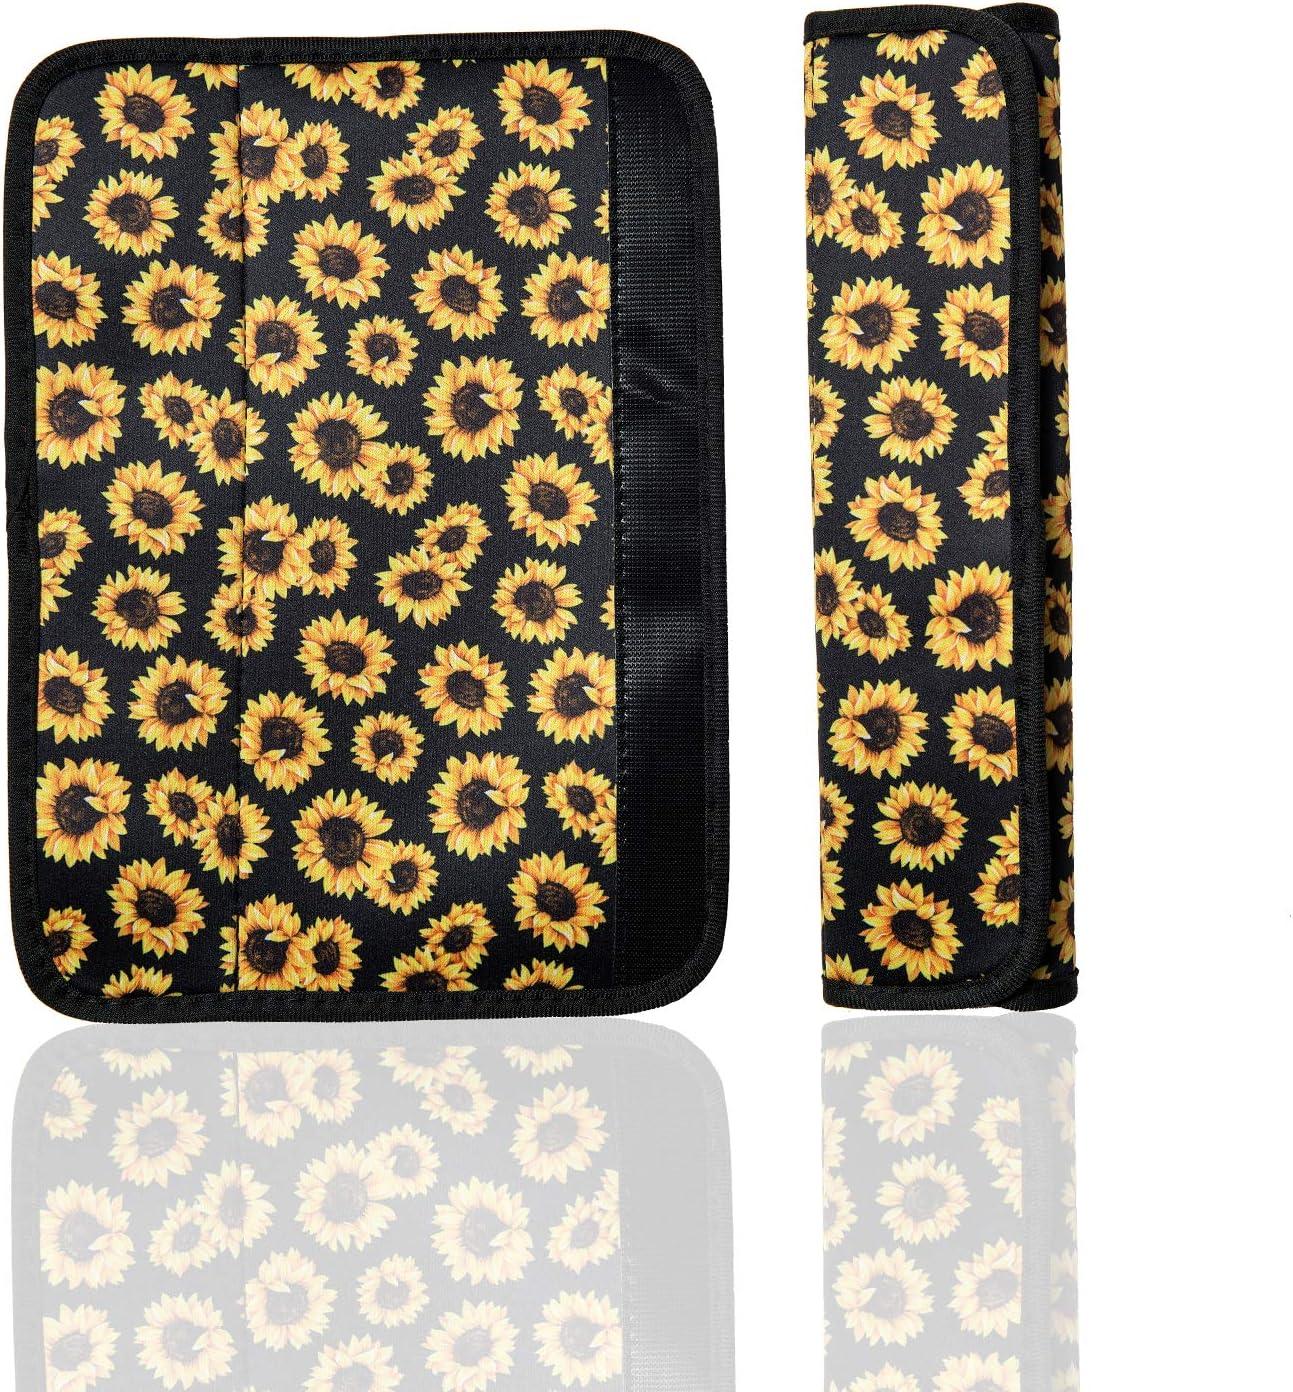 scomfy 2 Packs Steering Wheel Cover Car Seat Belt Pads Cover Universal Seat Belt Shoulder Strap Covers Harness Pad for Car//Bag Women and Men